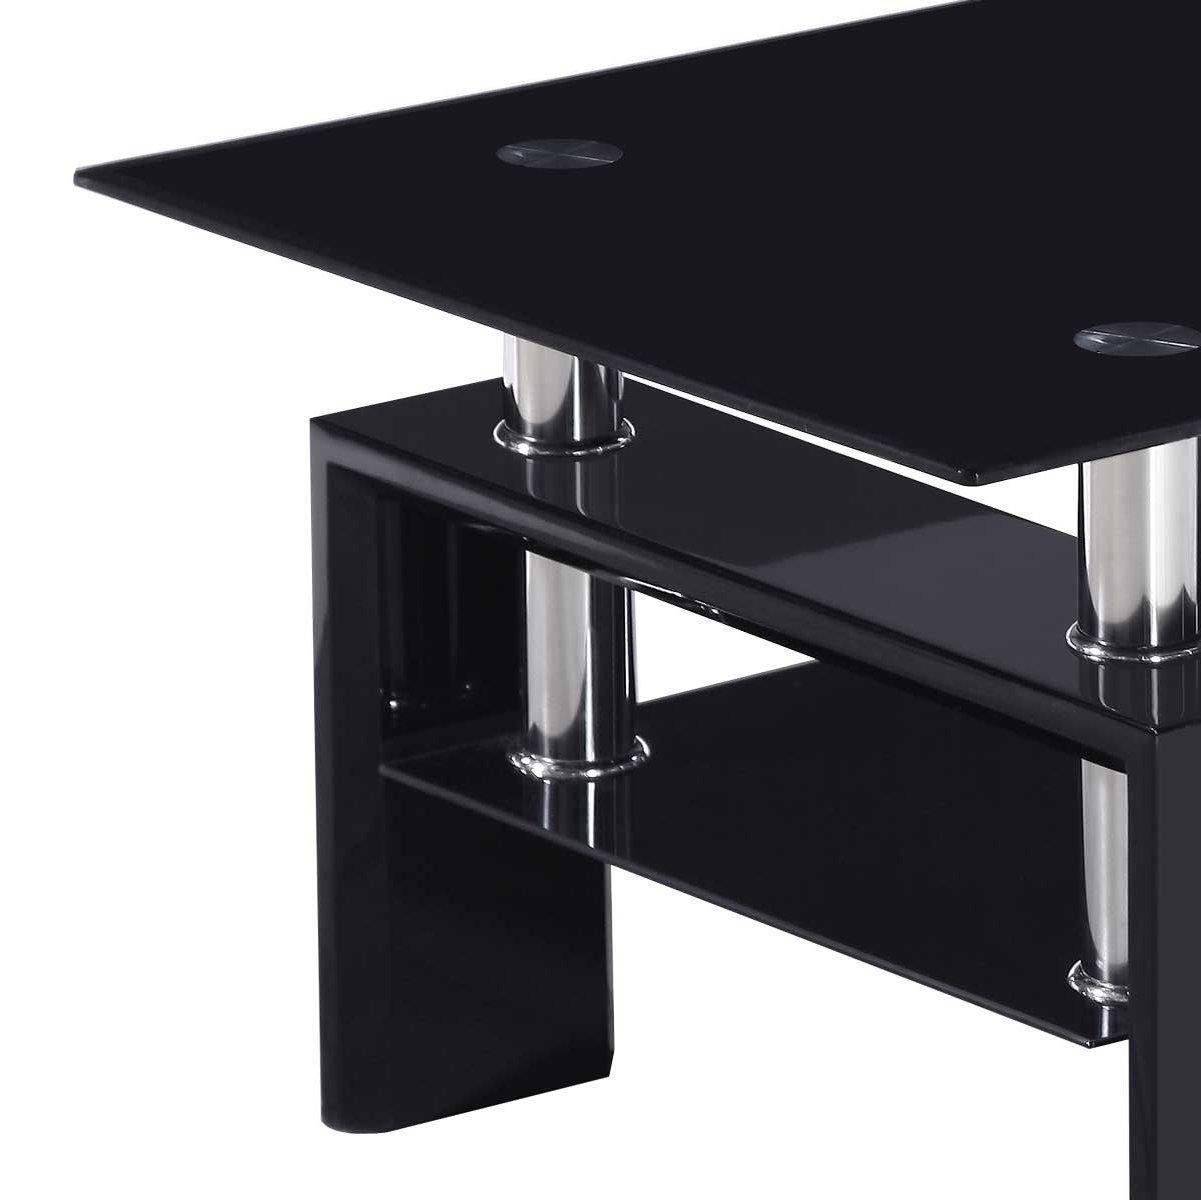 Valufurniture Metro Coffee Table Black Alternative Image